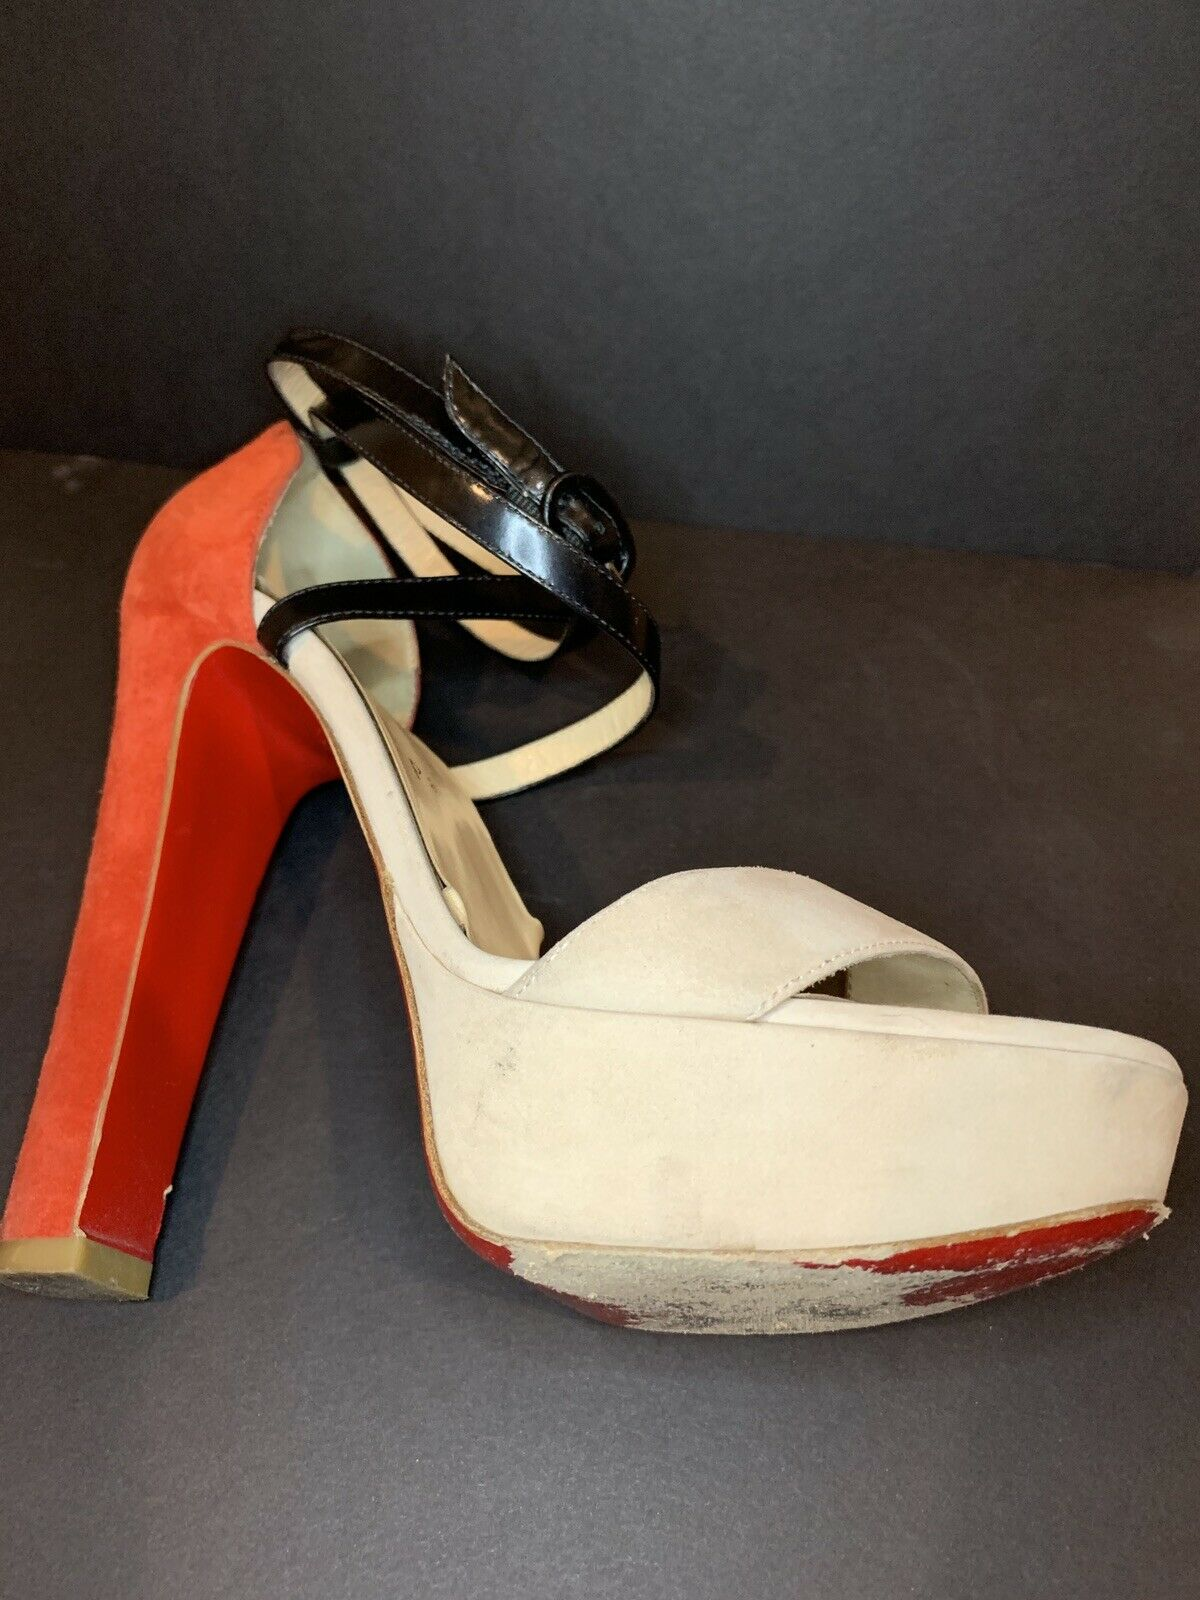 Christian Christian Christian Louboutin Summerissima Sandal Platform Ankle Strap Heels 36.5 1085fe